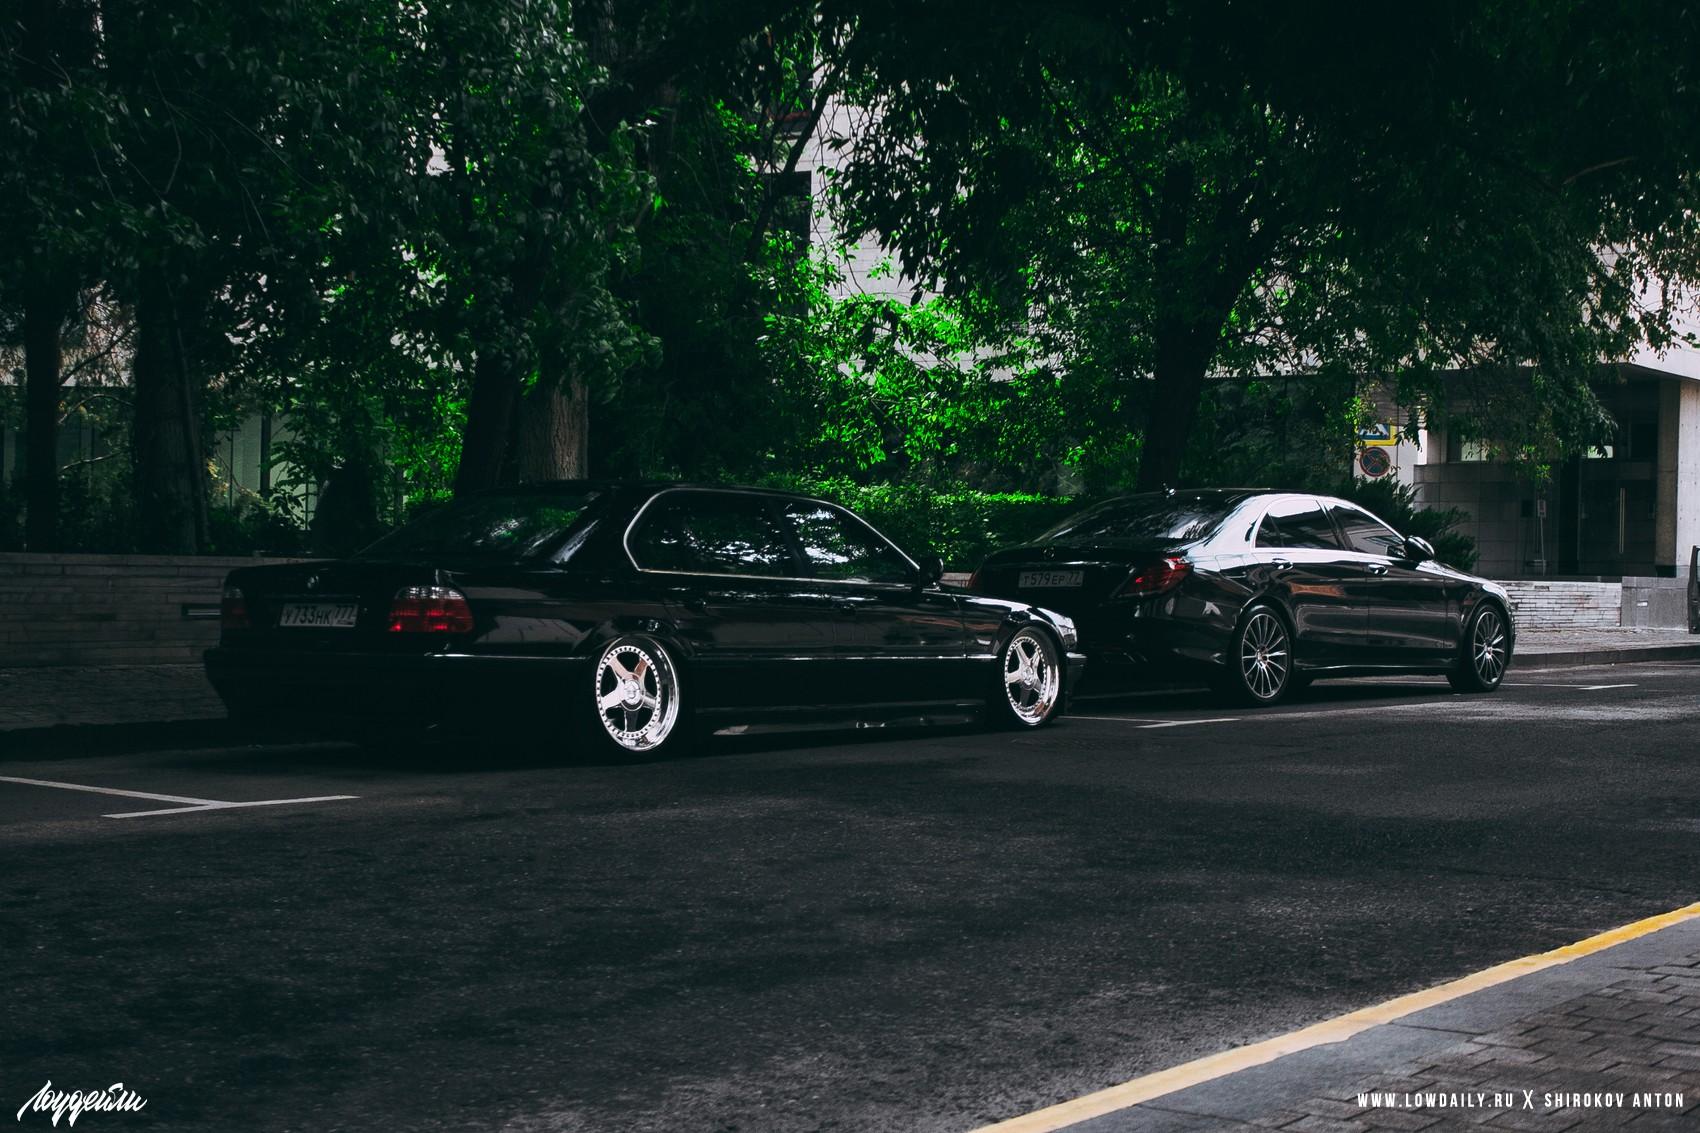 BMW E38 Lowdaily _MG_7101